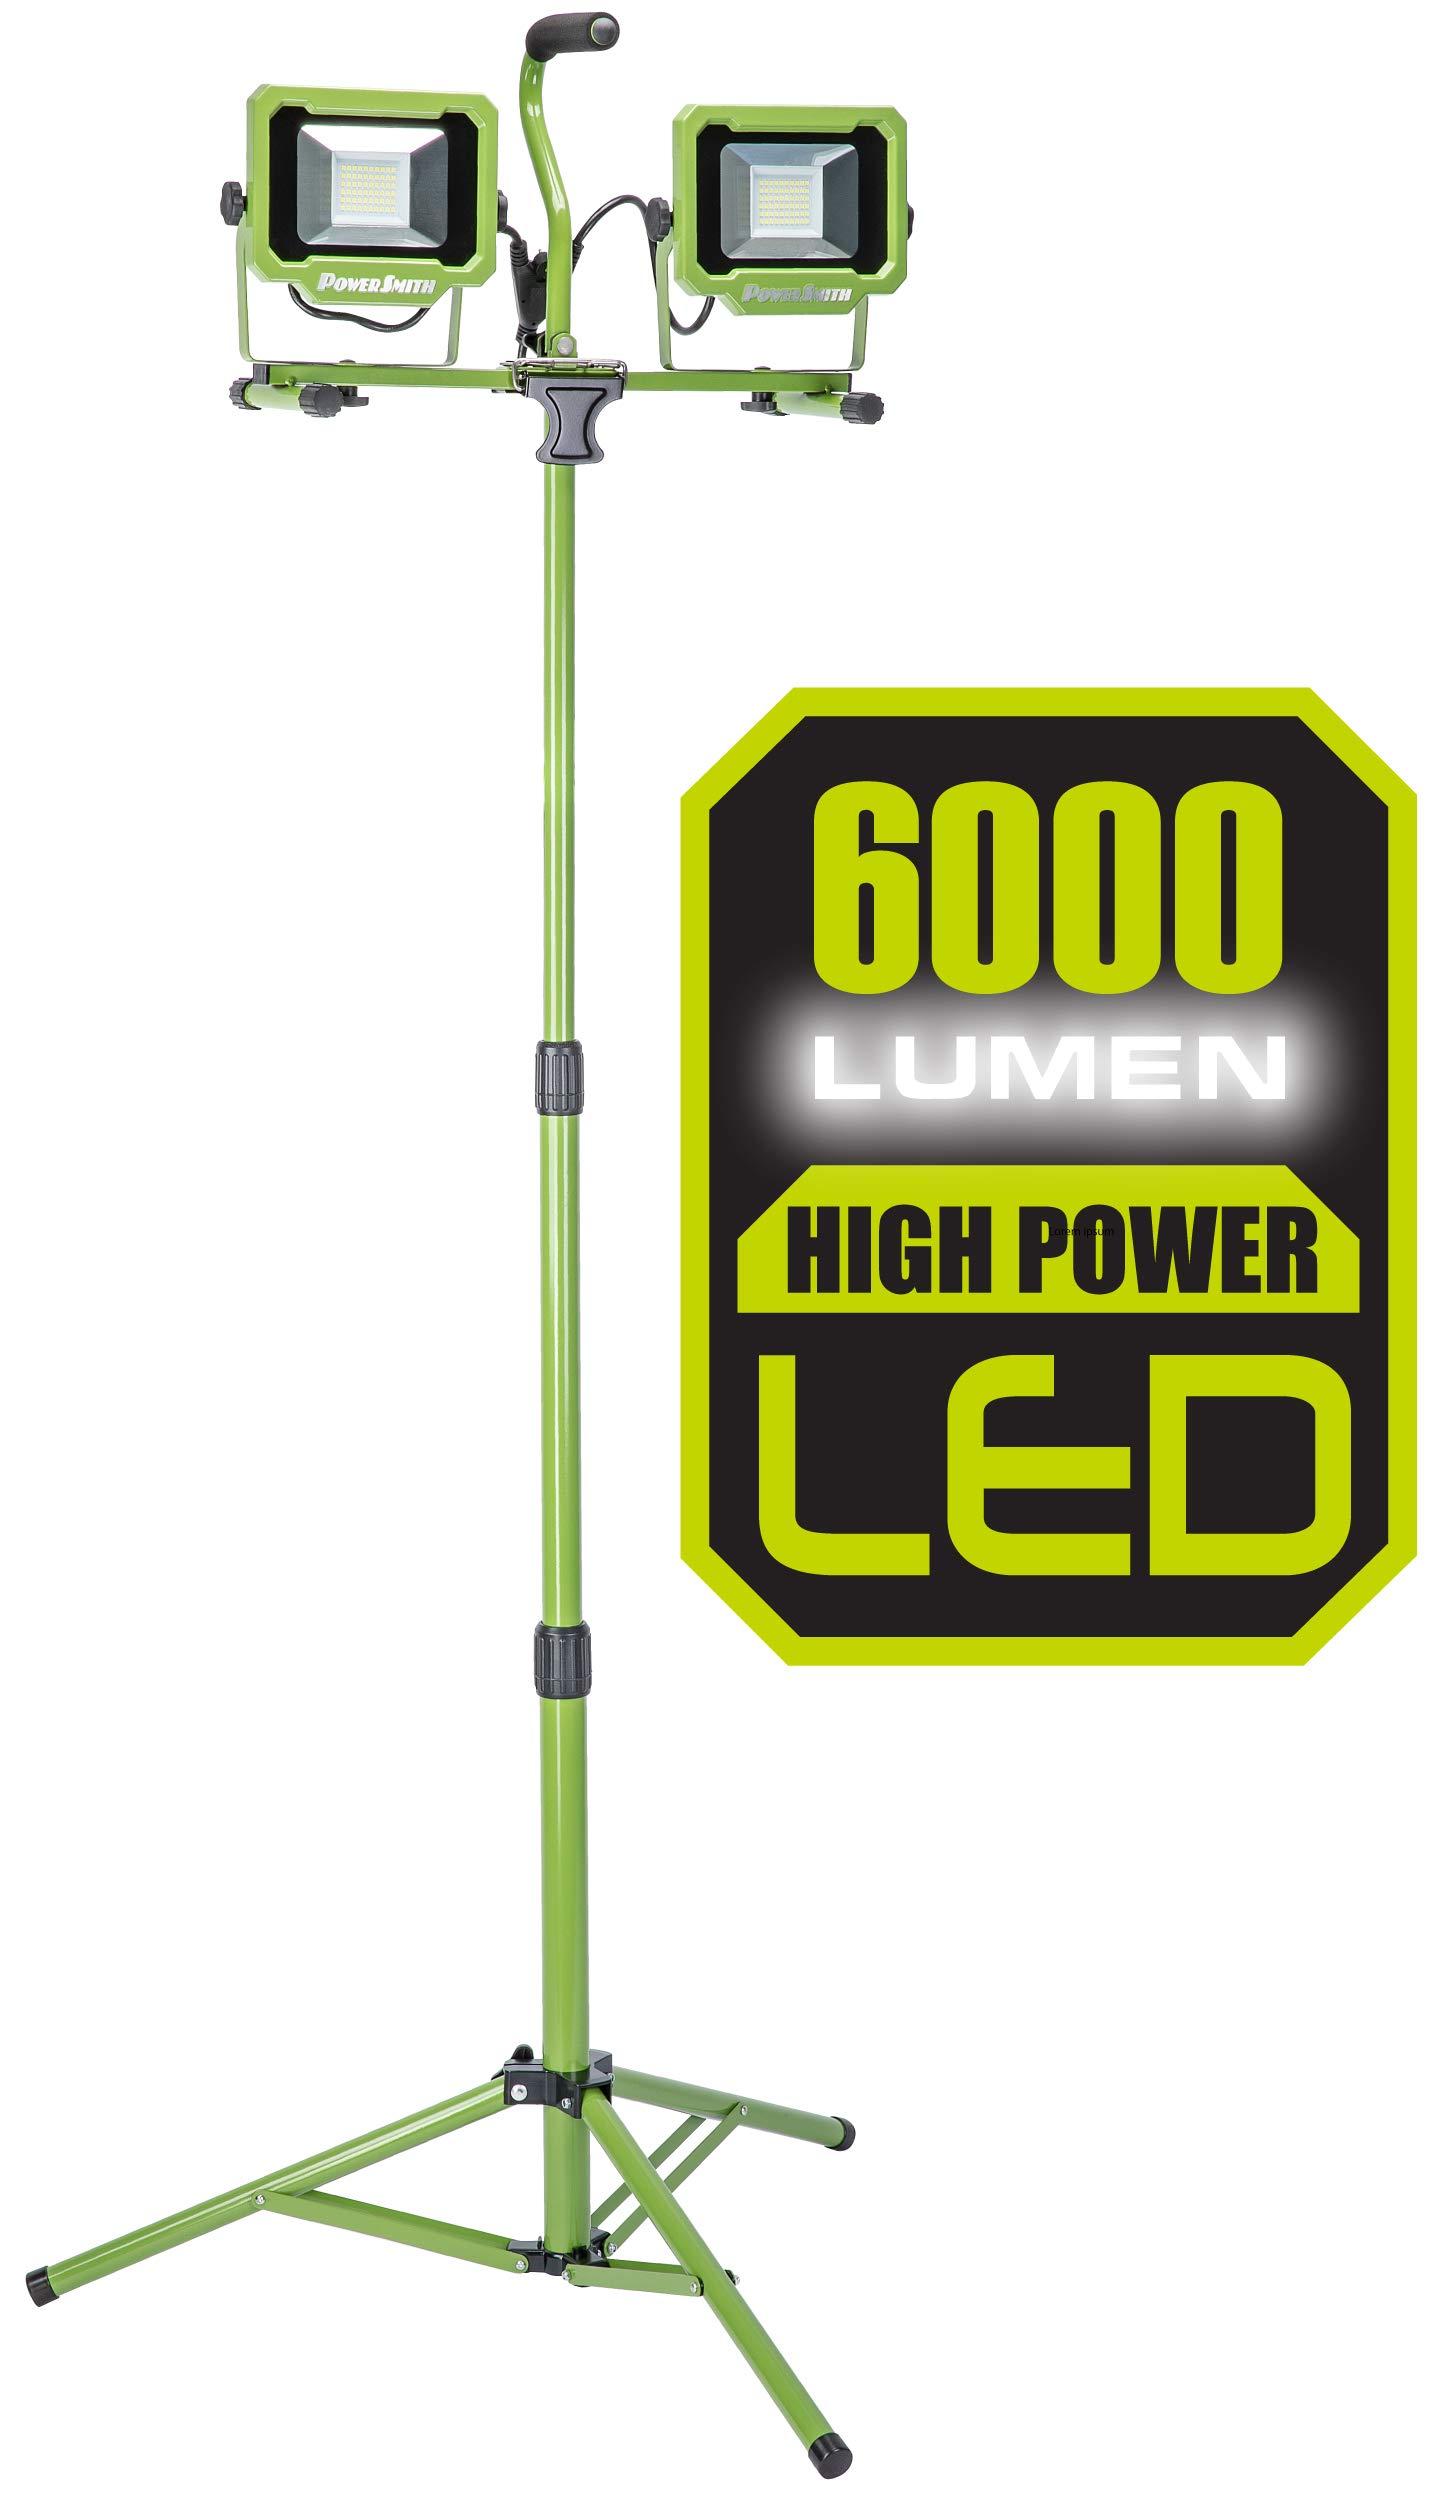 PowerSmith PWL2060TS 6,000 Lumen LED Dual Head work light with Adjustable Metal Telescoping Tripod Green